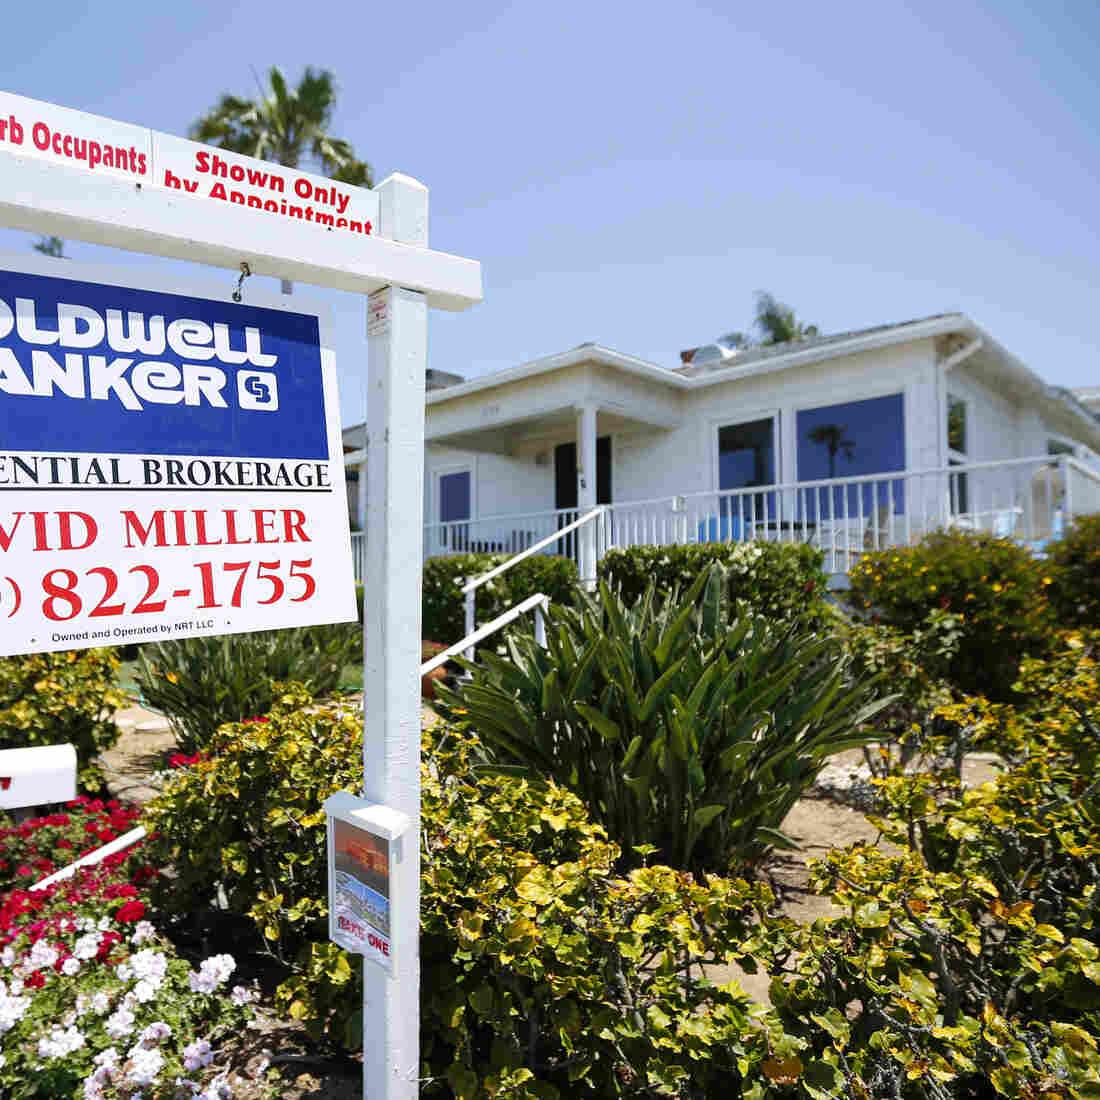 This single family home was for sale last week in Encinitas, Calif.